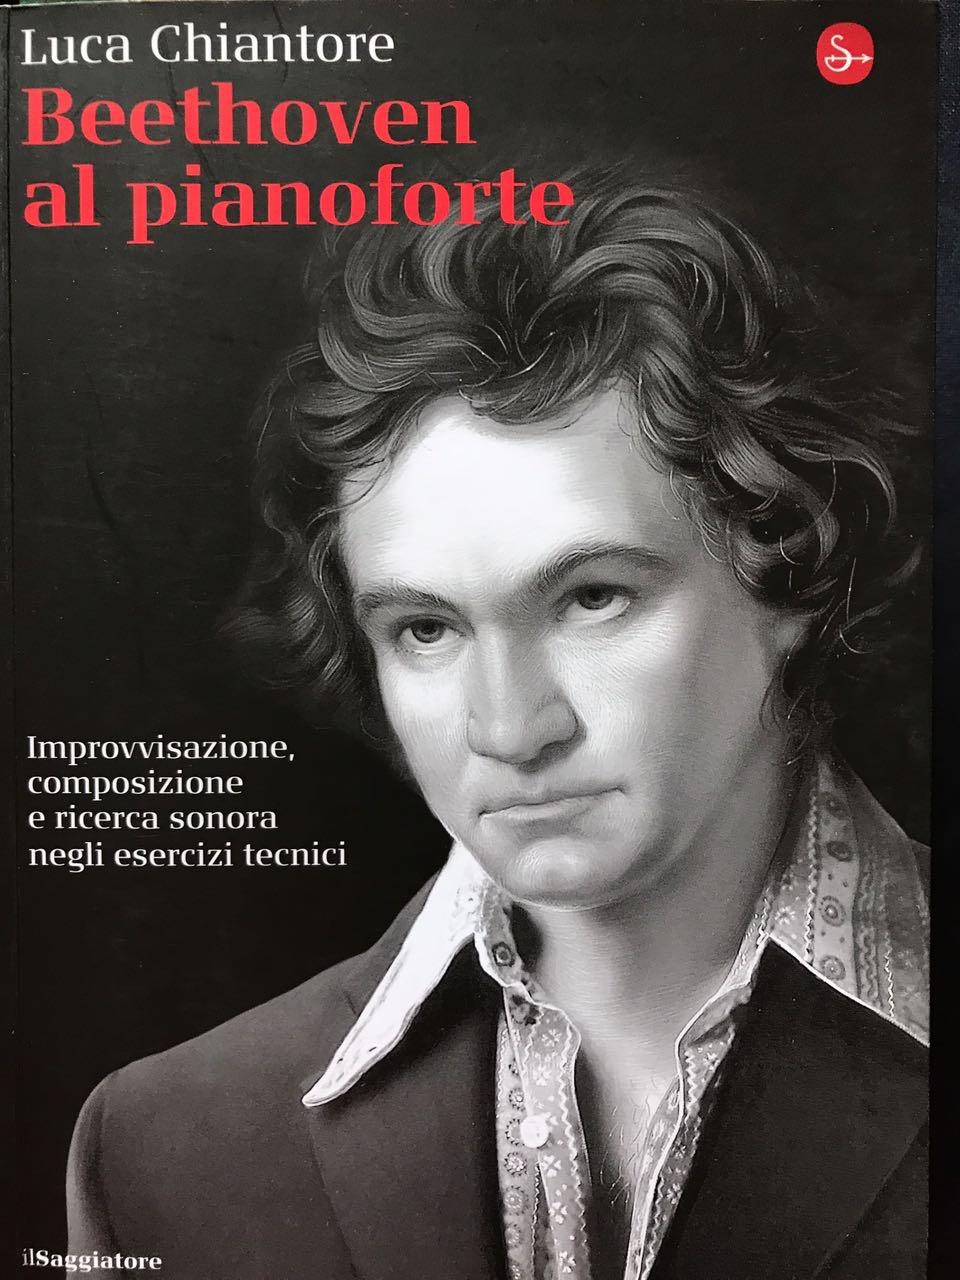 Chiantore Luca